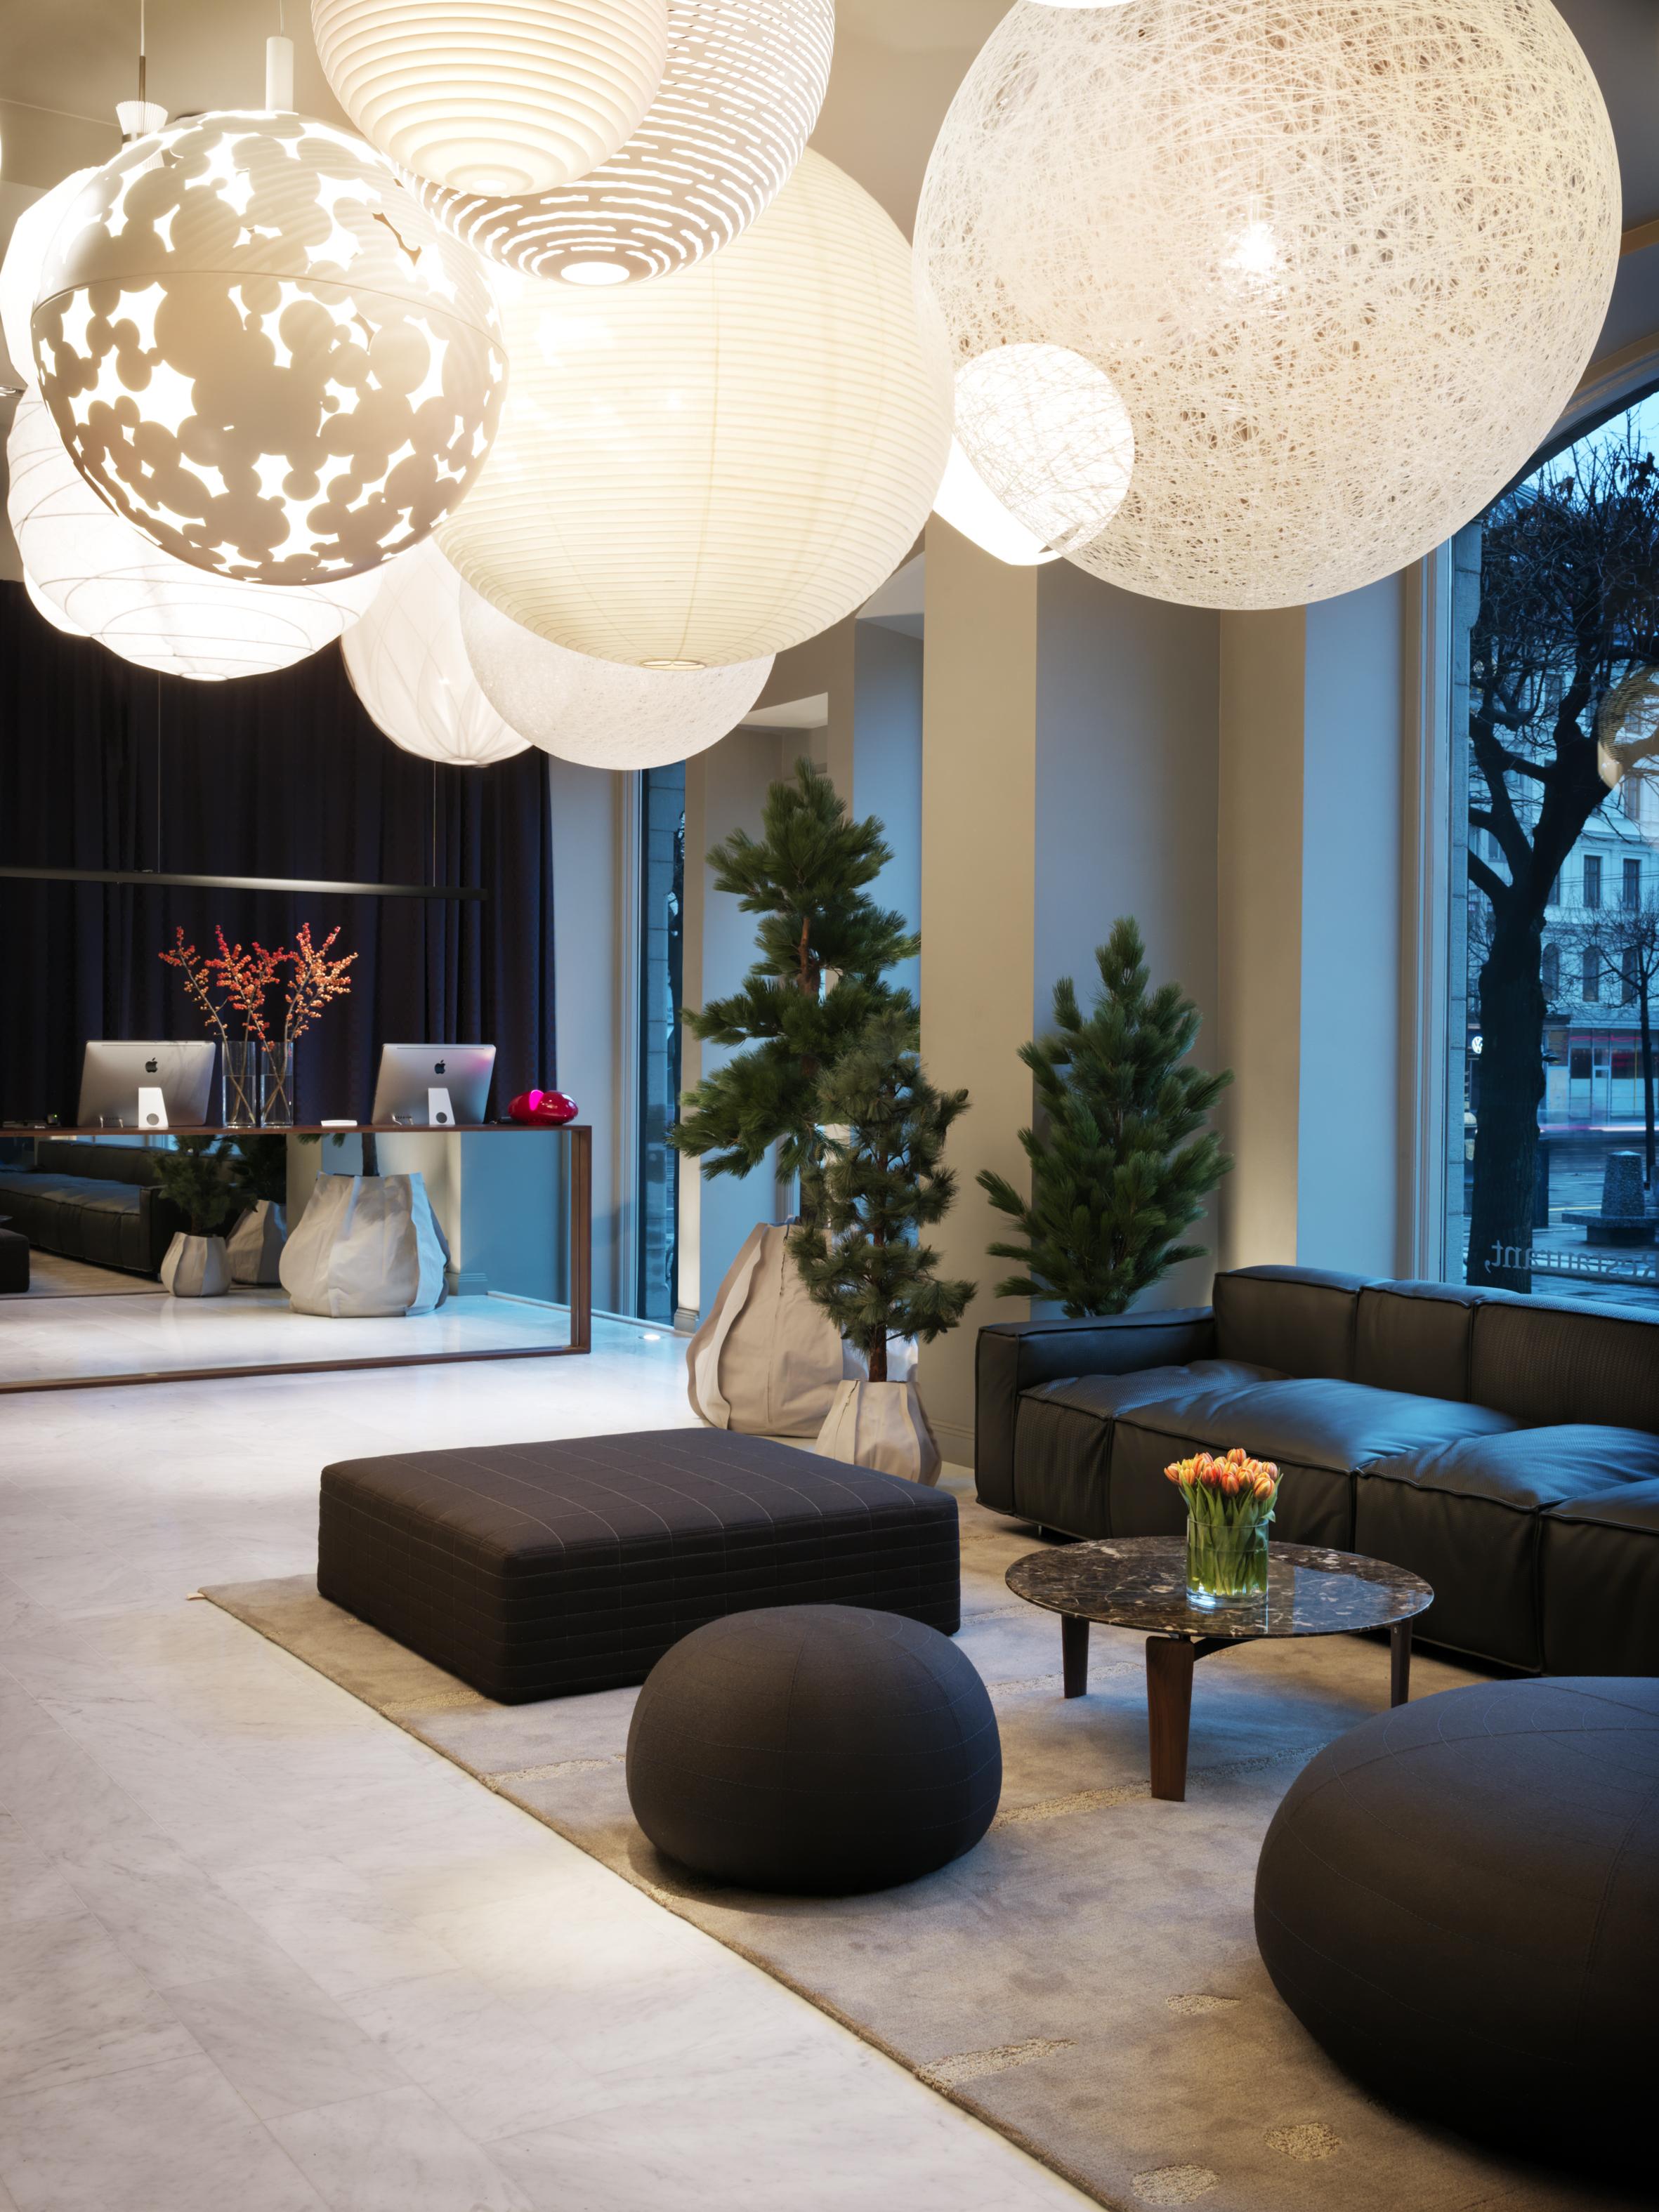 Nobis hotel architectural holidays for Design hotel wurzburg